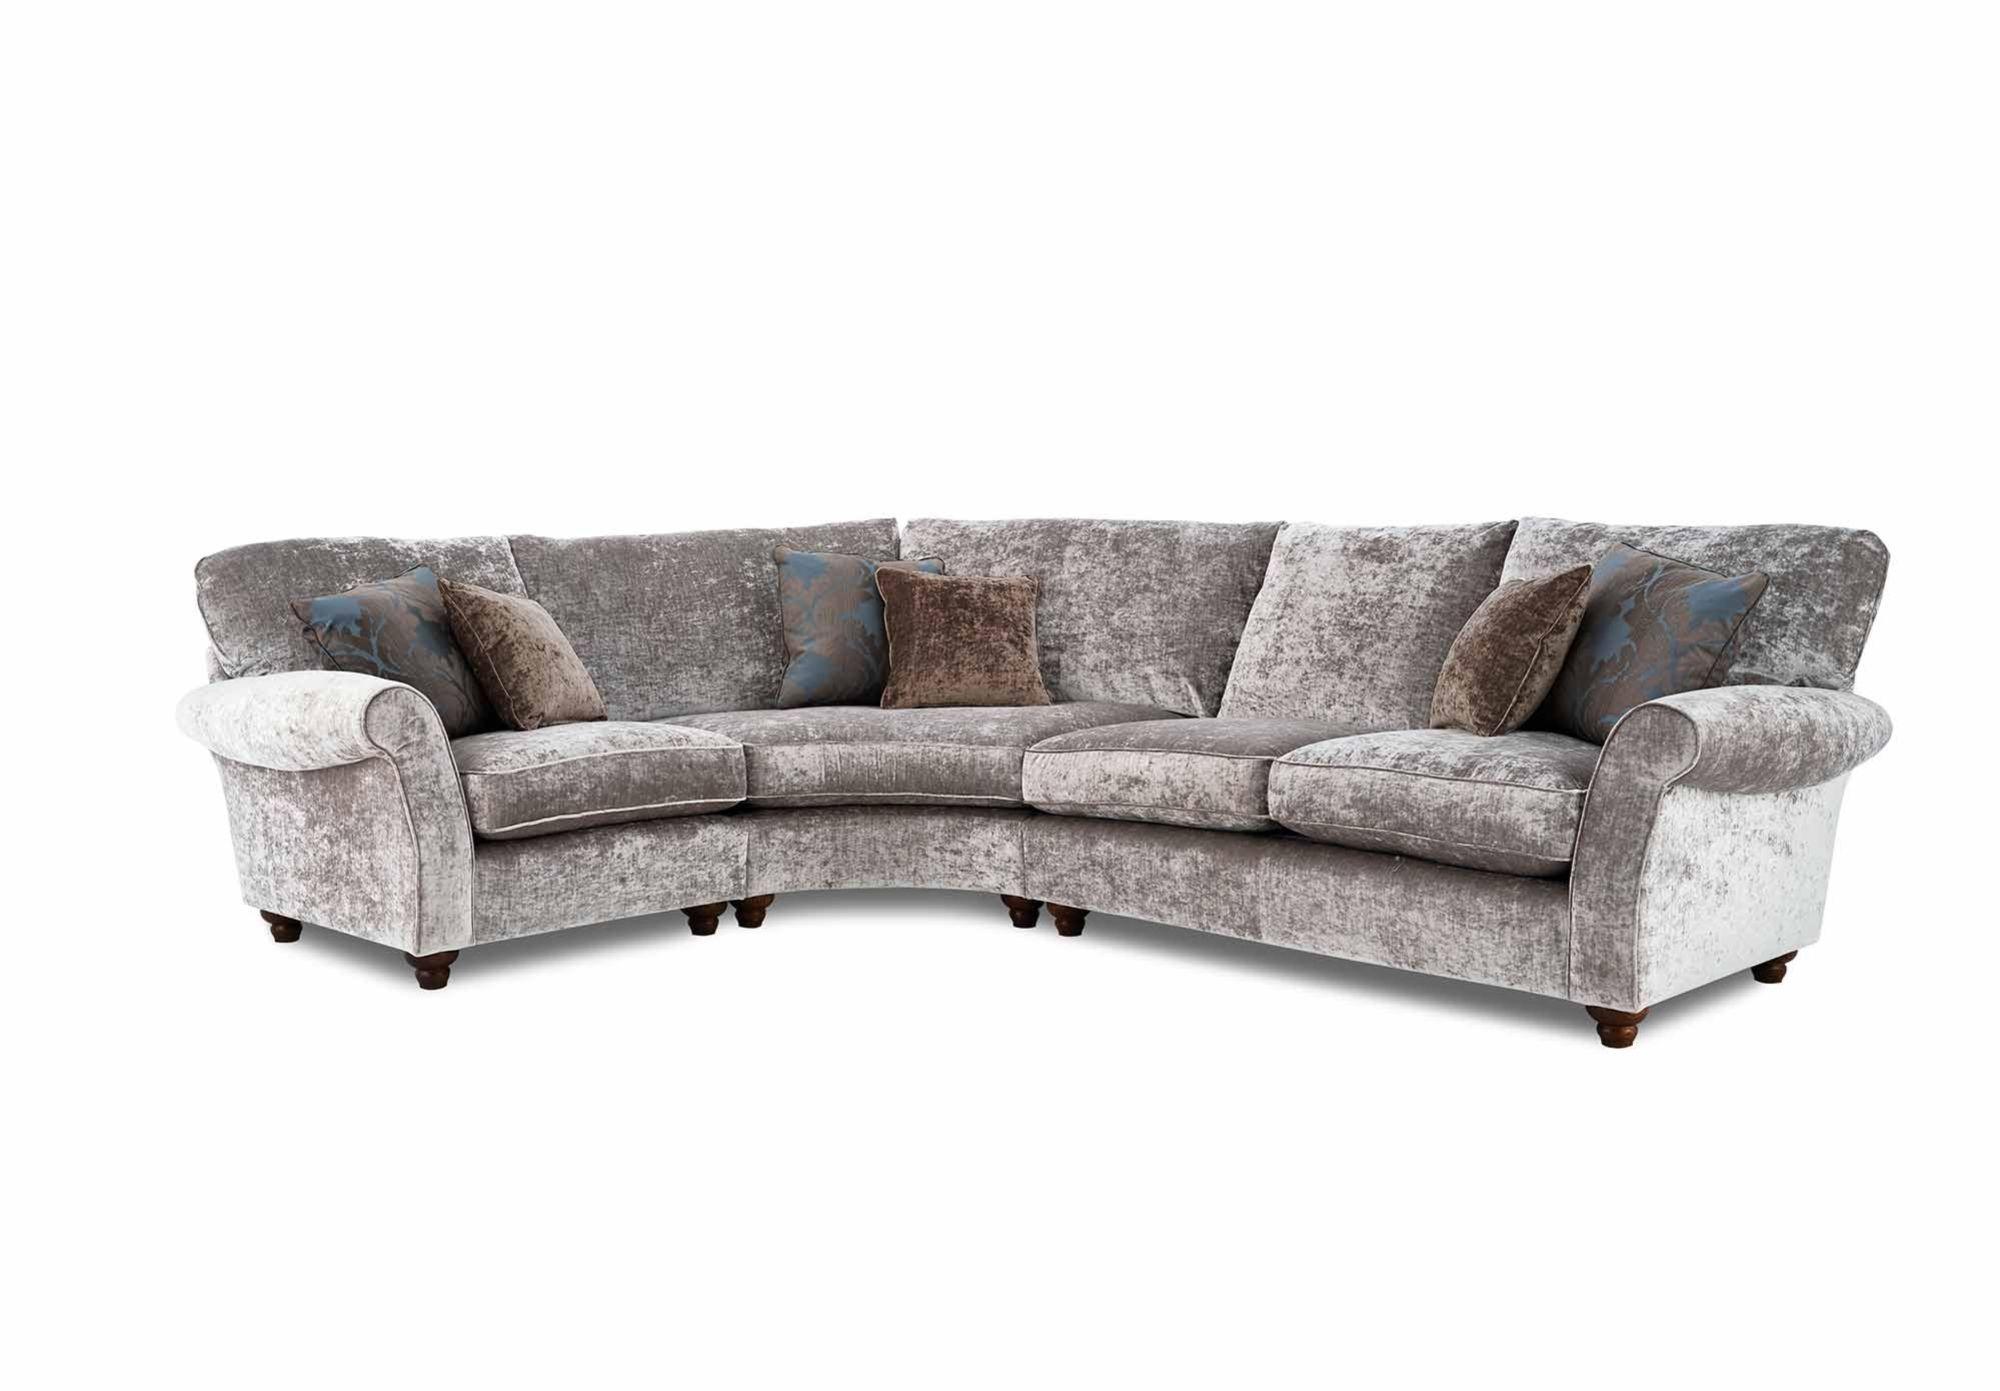 Furniture Village Sofas lhf classic back corner sofa - monroe - gorgeous living room